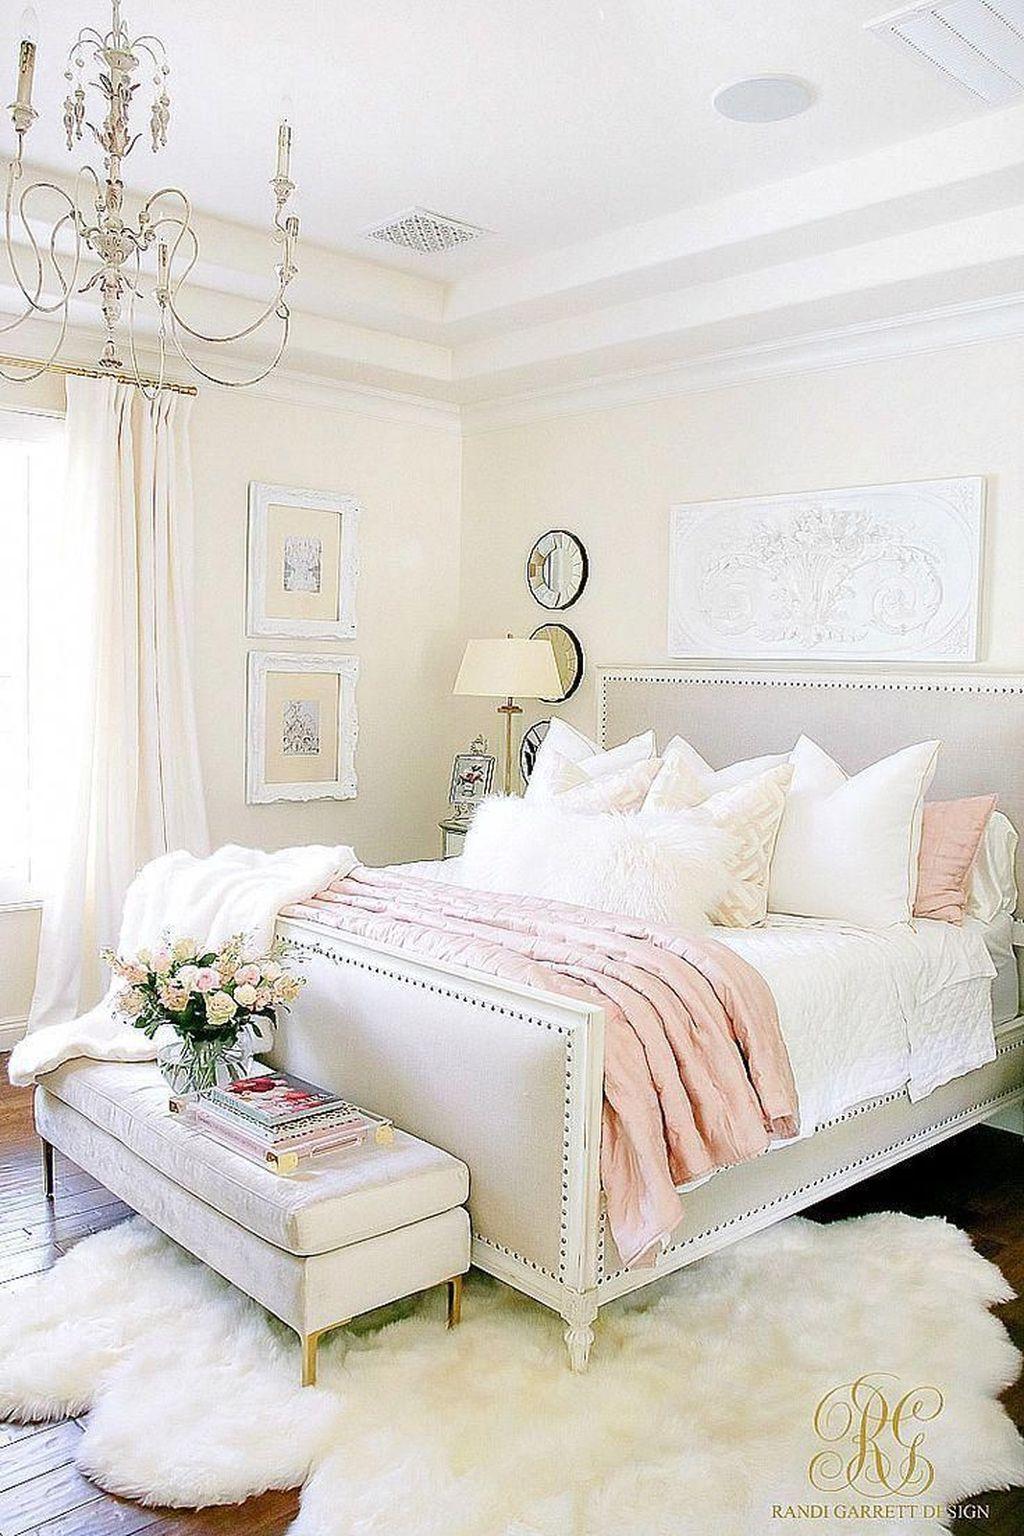 Lovely Spring Bedroom Decor Ideas Trending This Year 28